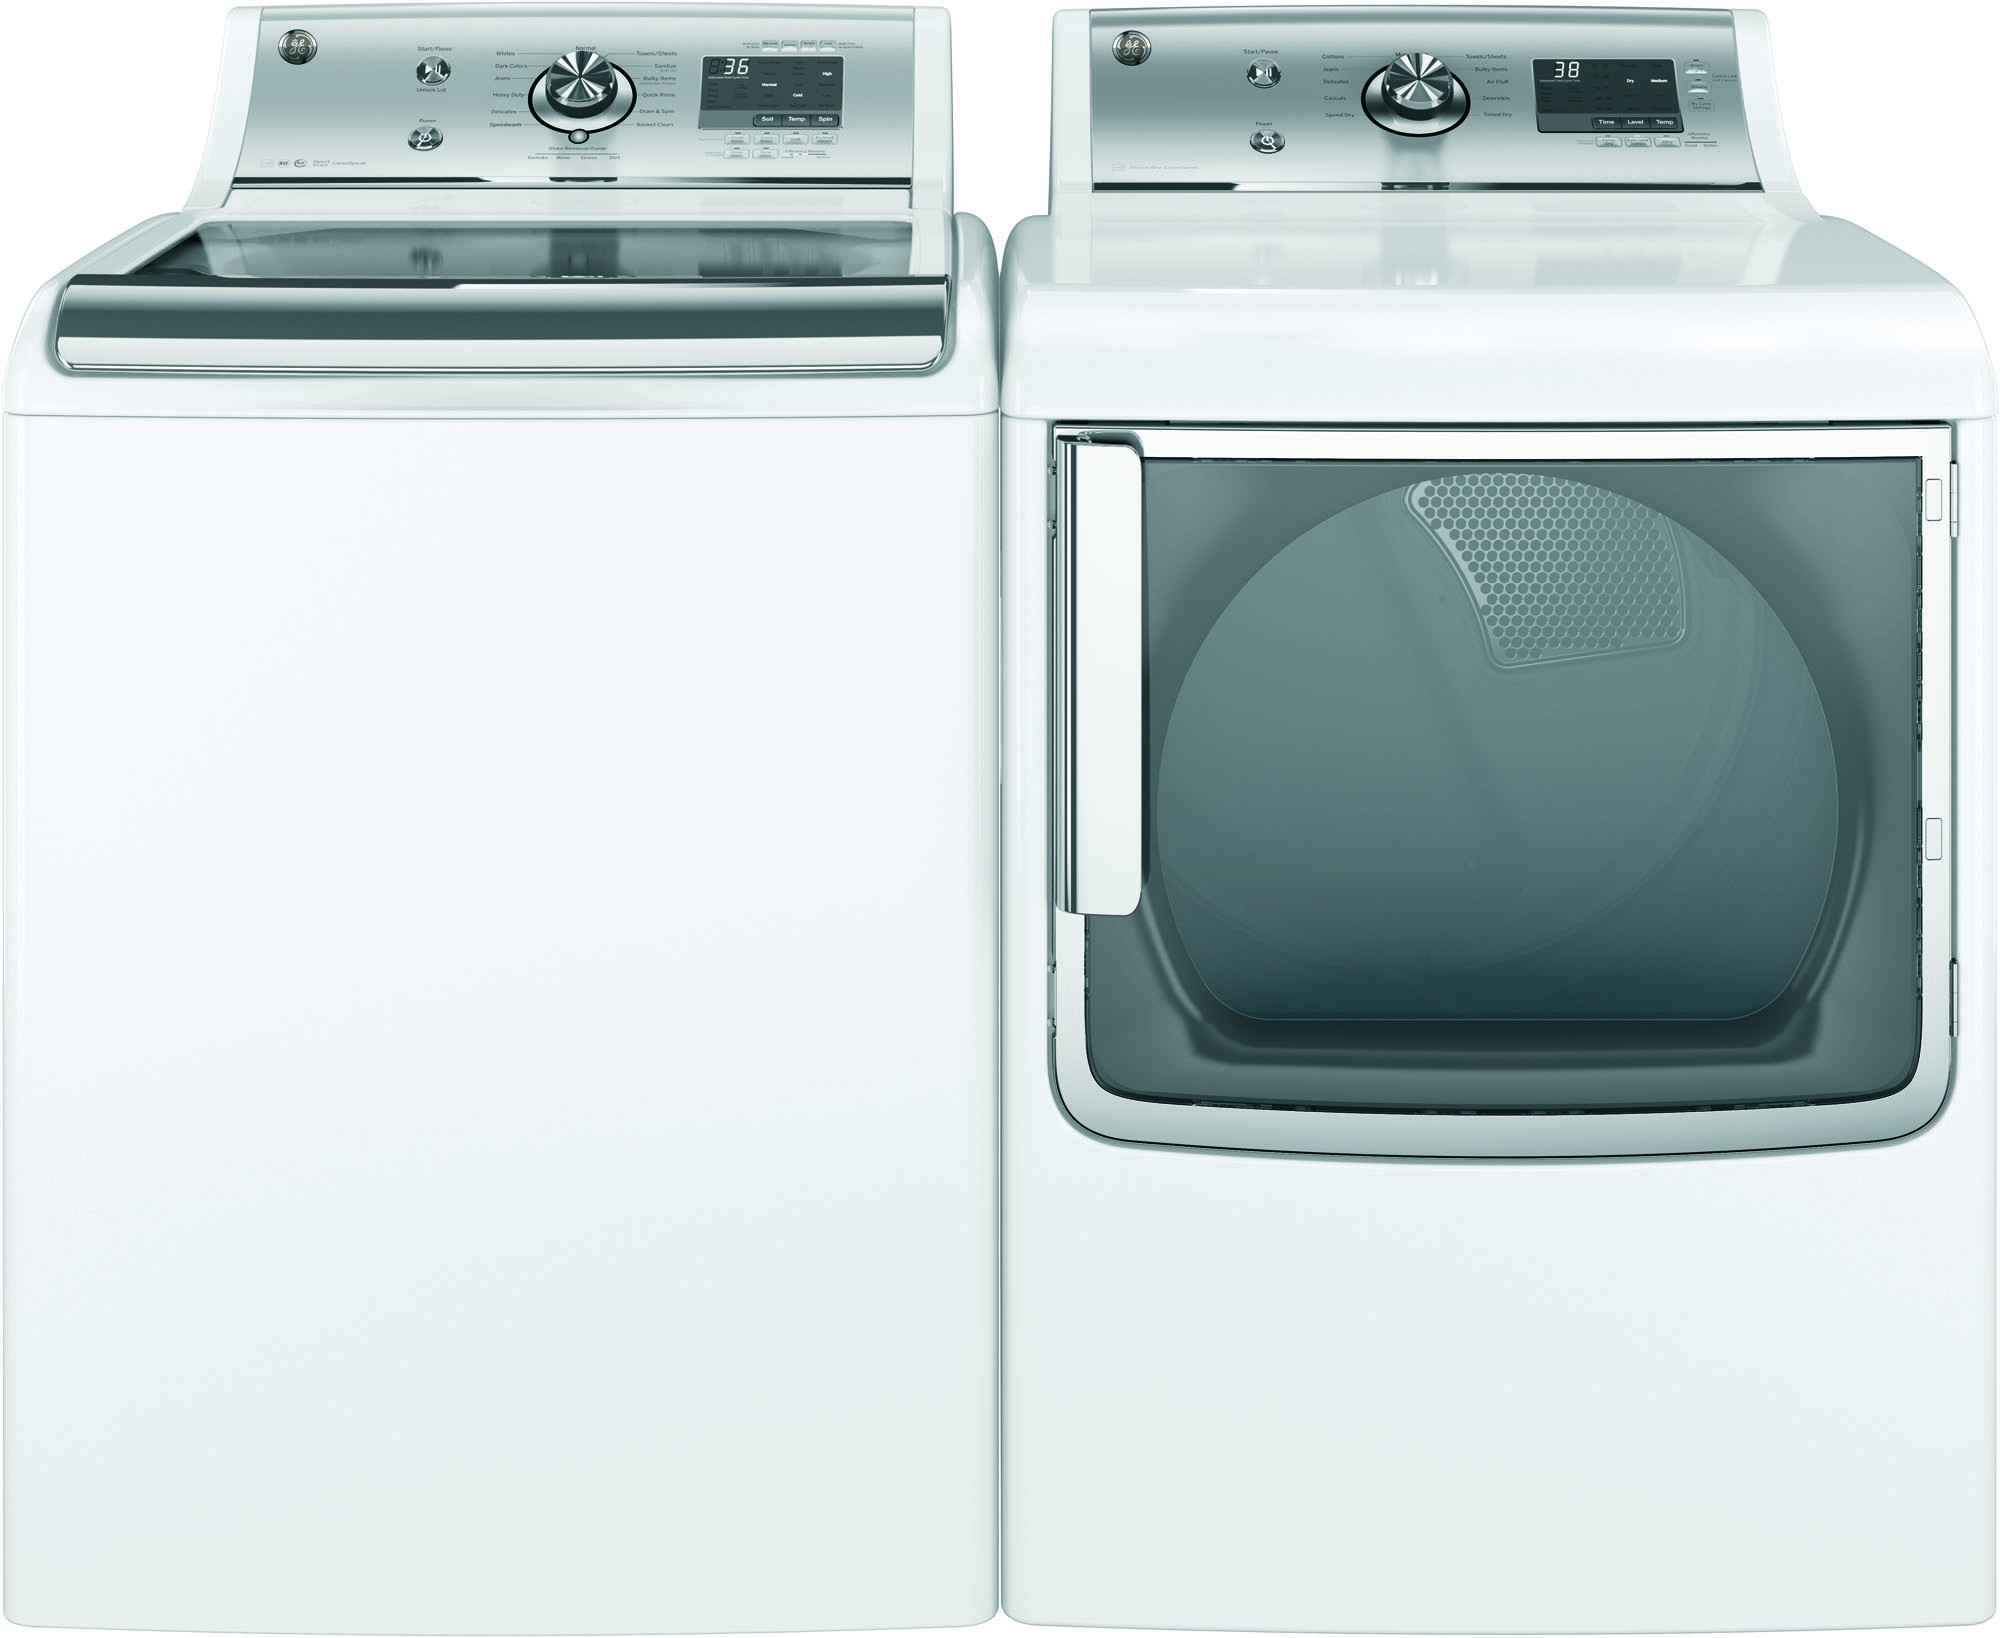 GE Appliances GTD81ESSJWS 7.8 cu. ft. Electric Dryer - White